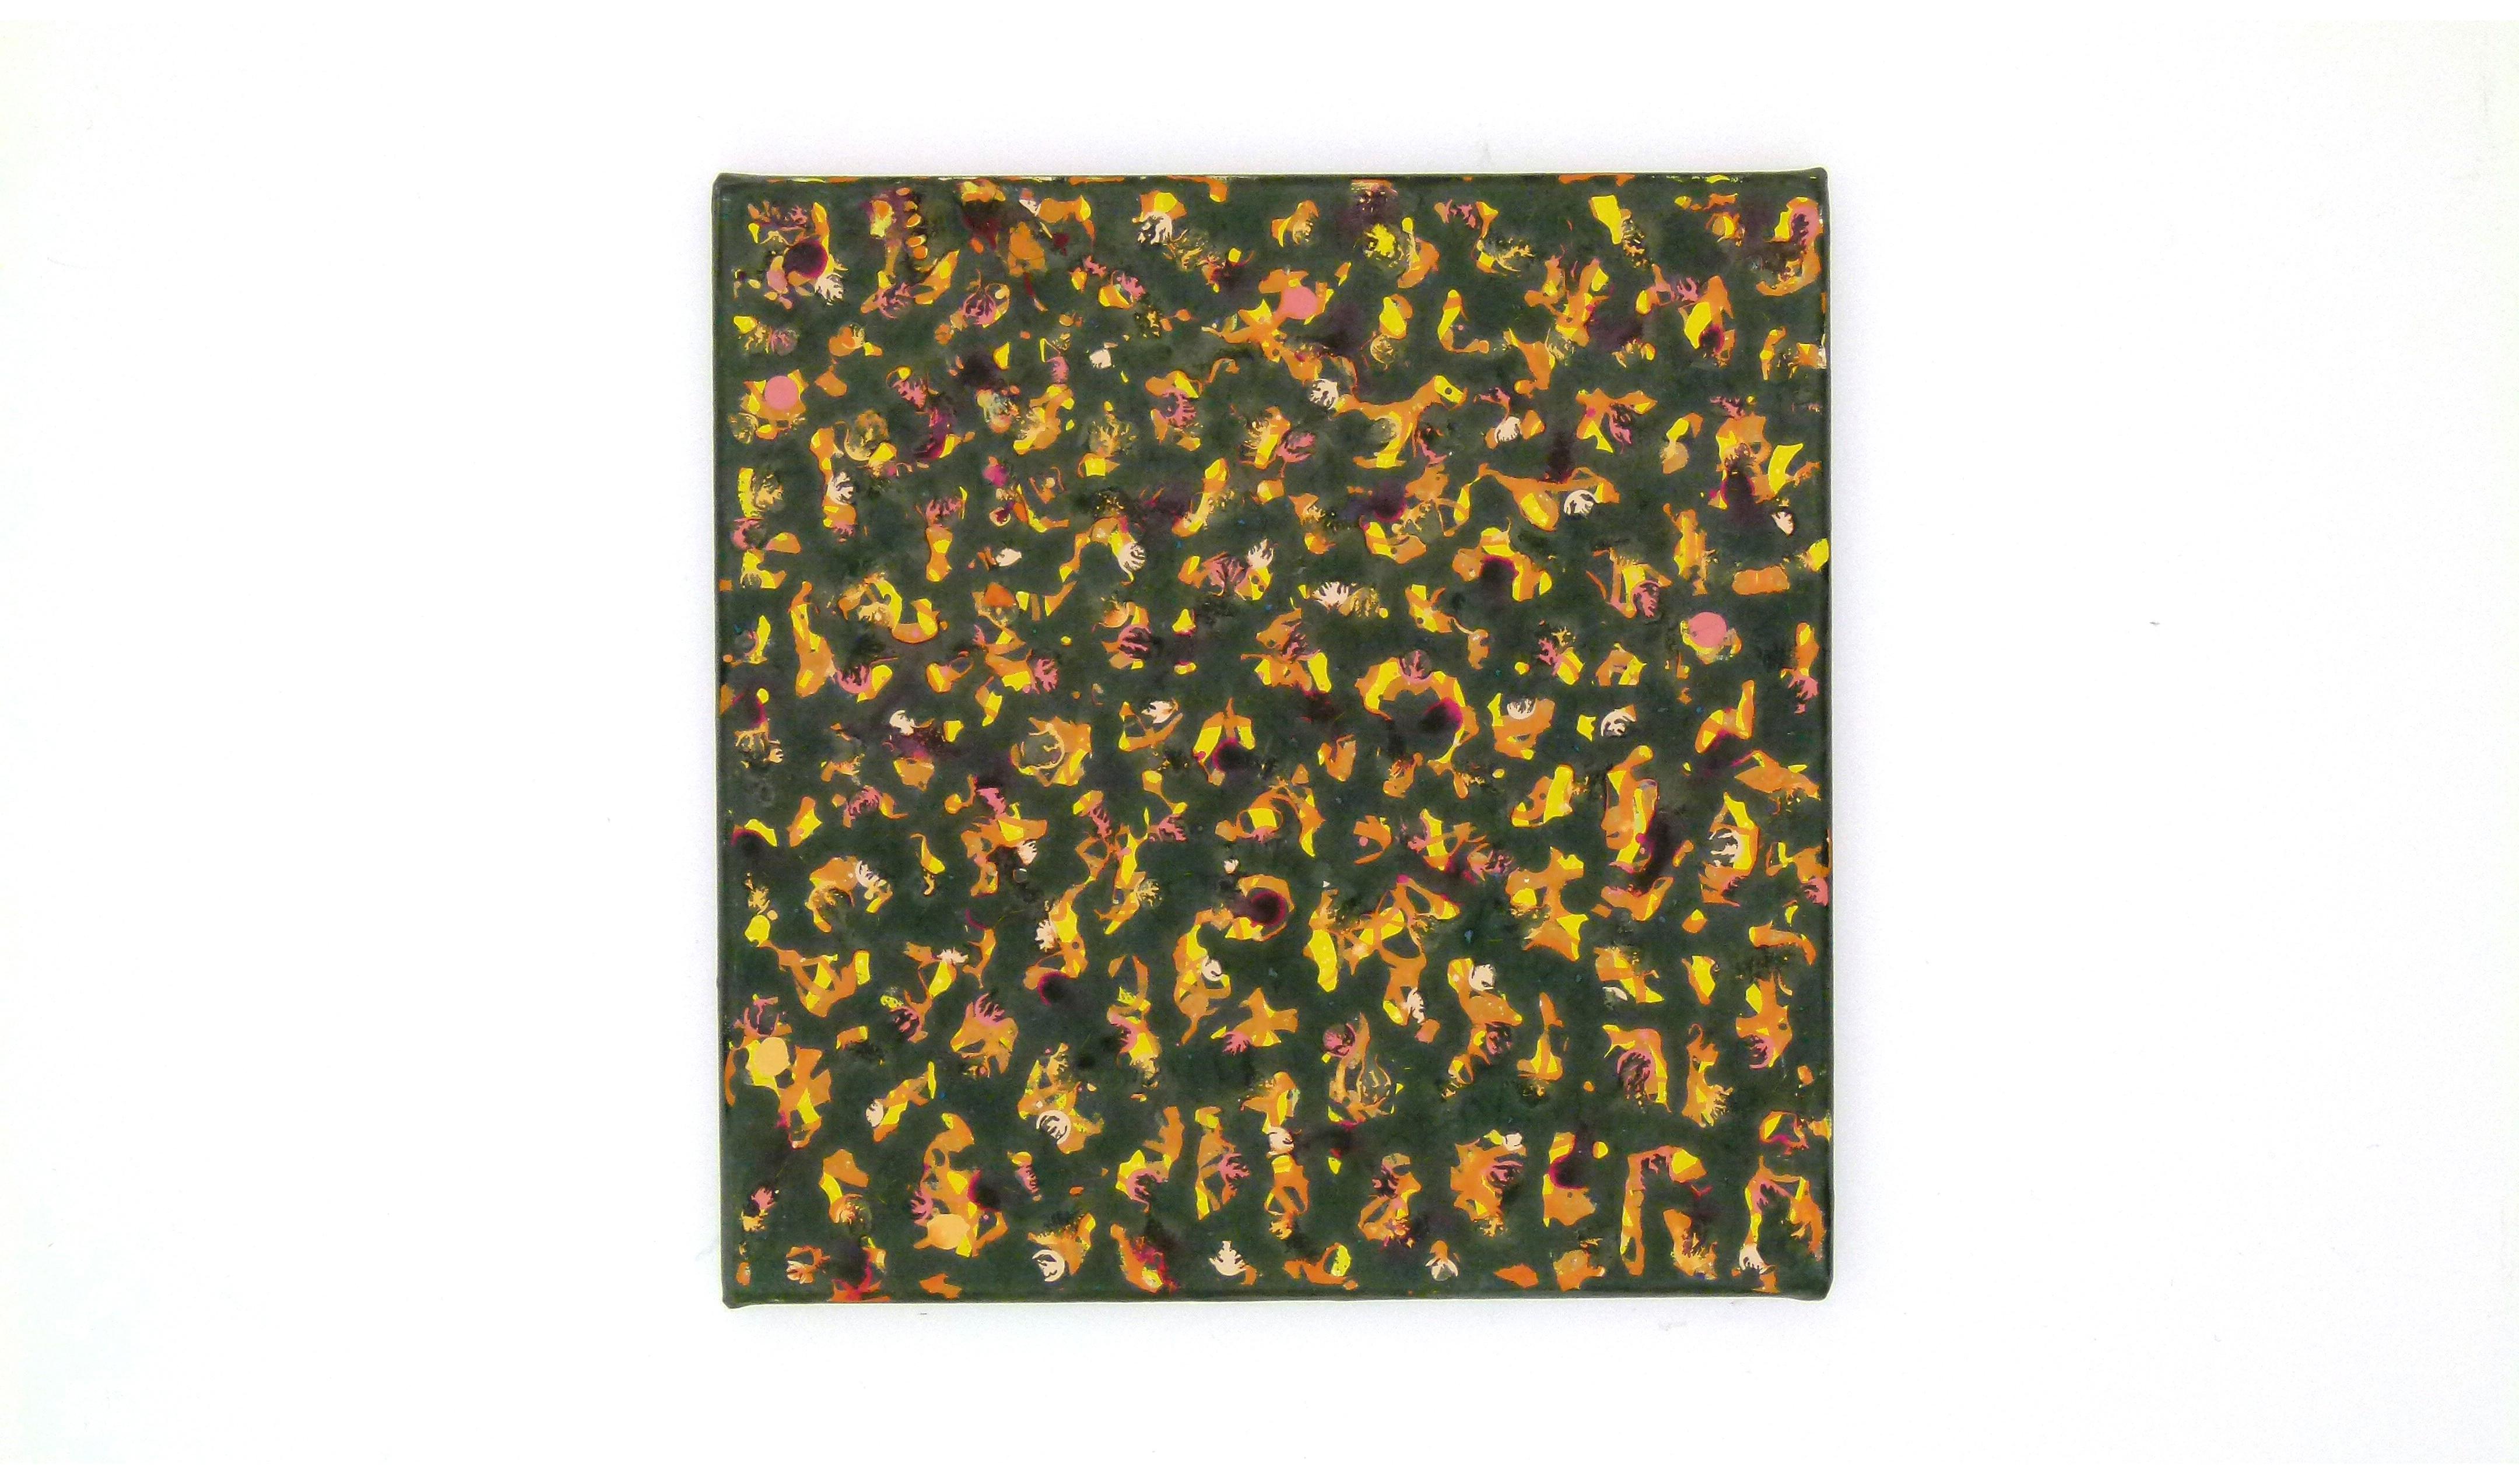 Farbige Tusche auf Leinwand 2007_0000_L1100044a